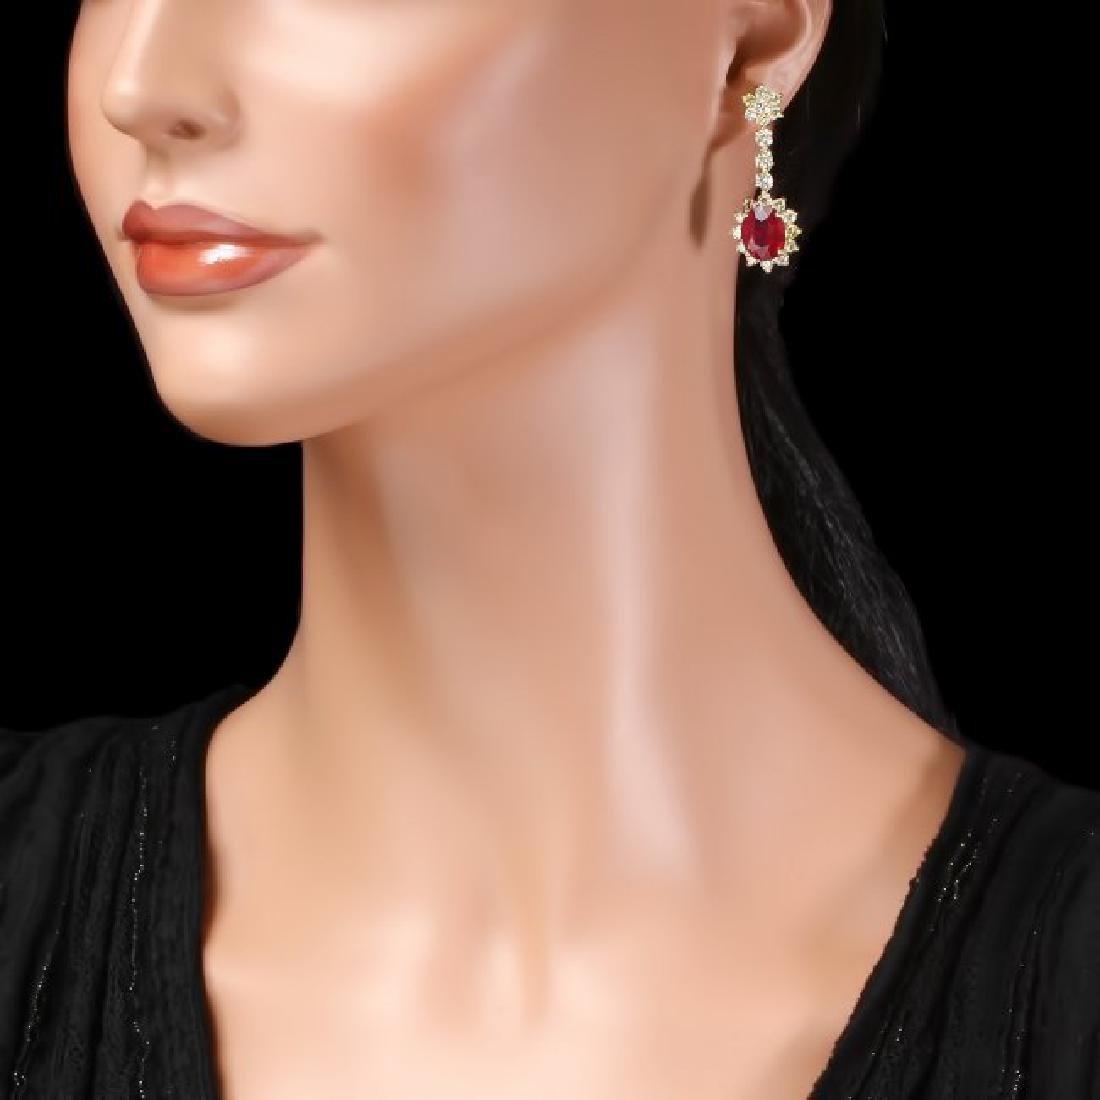 14k Gold 9.50ct Ruby 3.90ct Diamond Earrings - 3